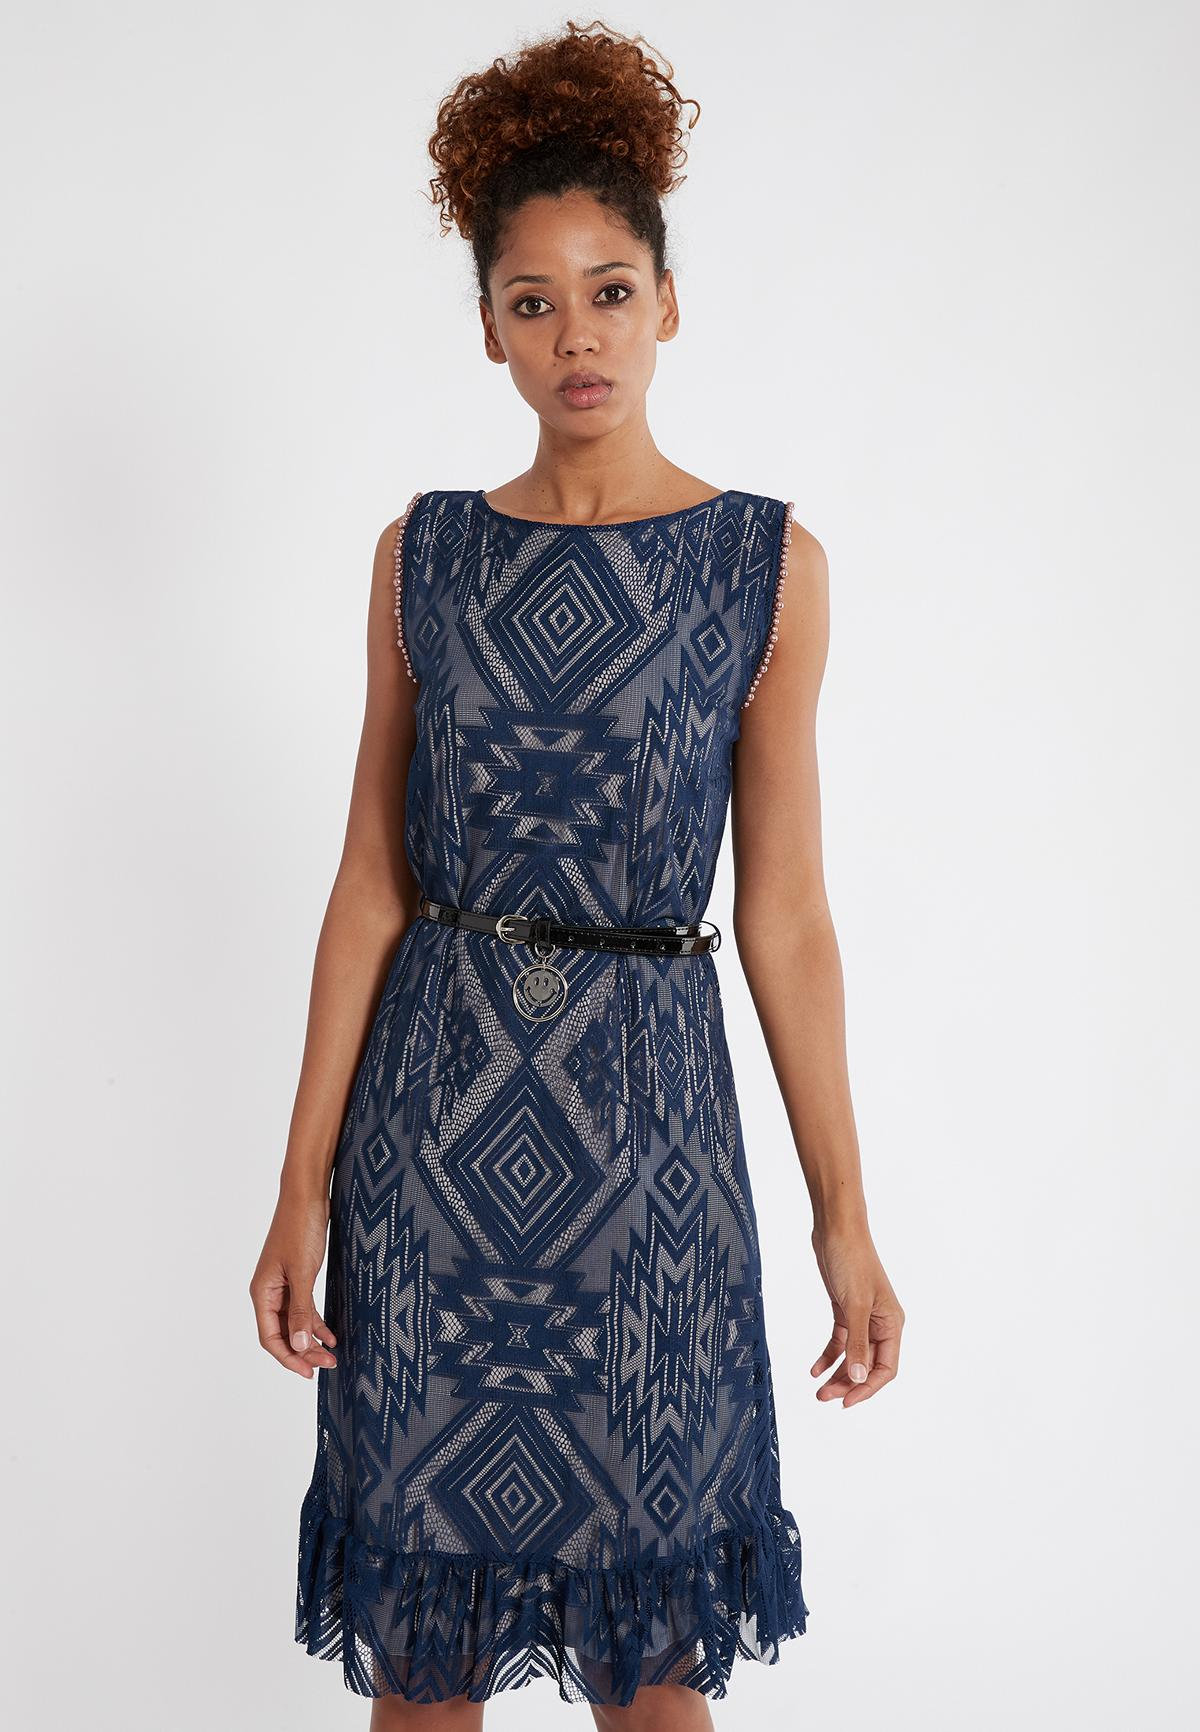 Front of Ana Alcazar Sleeveless Dress Saprona  worn by model